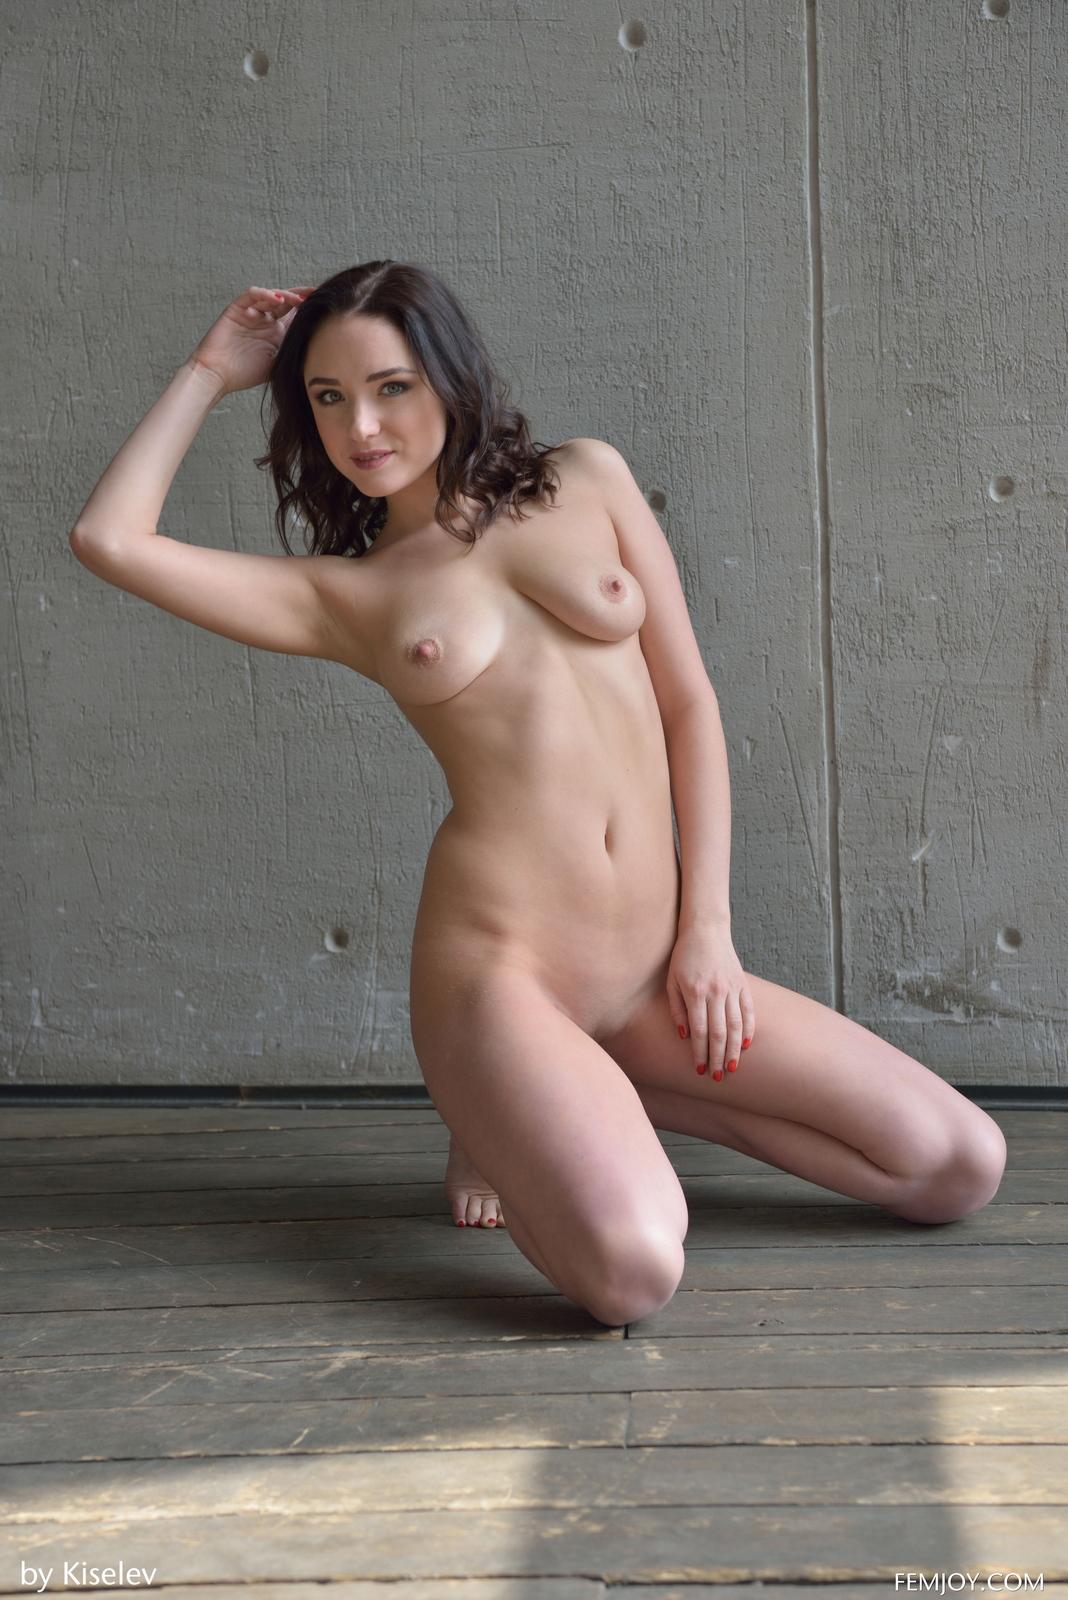 nika-a-naked-bottomless-grey-shirt-pussy-femjoy-25